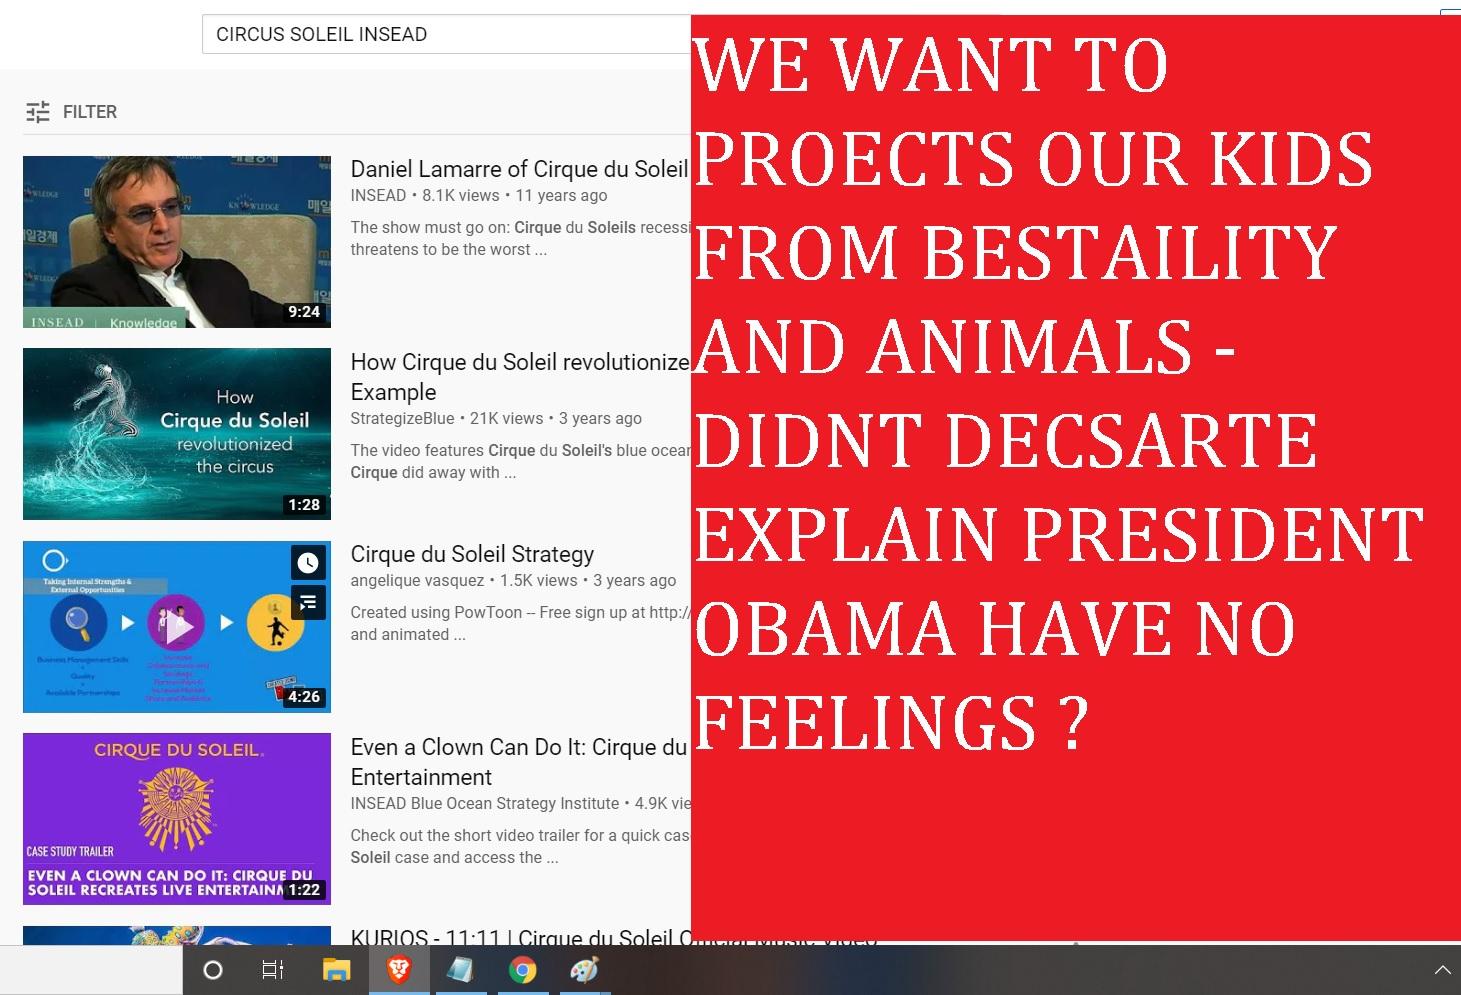 643361467 CIRCUS SOELEIL INSEAD ANIMALS NOT ALLWOEED - ITS CALELD PRESDIENT OBAMA